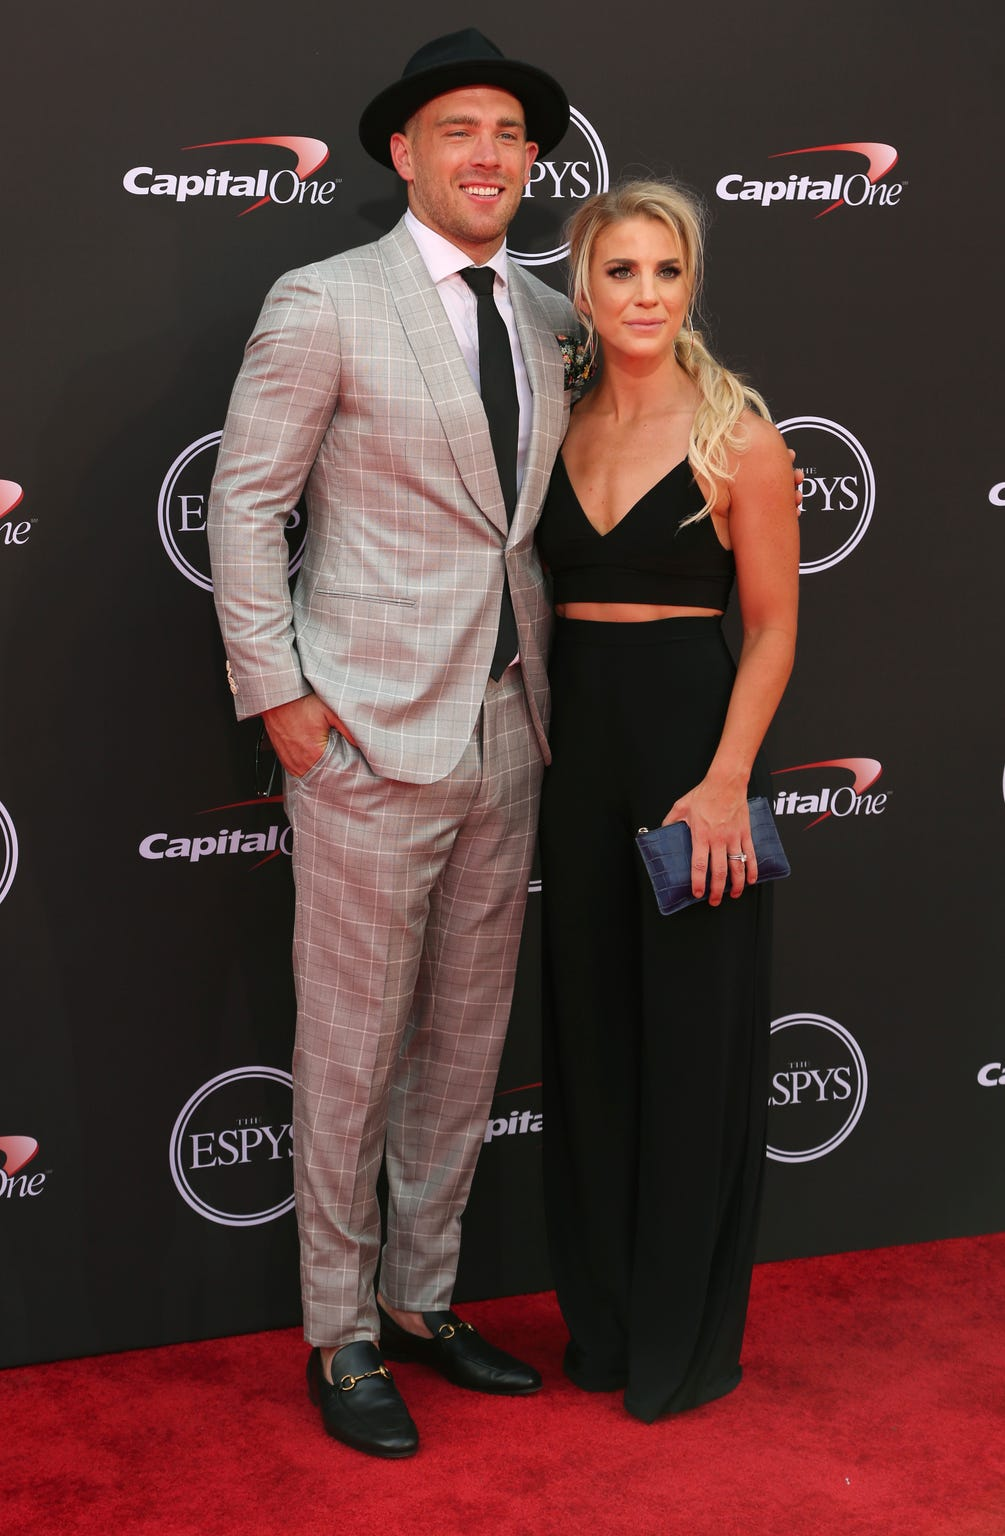 Julie Ertz and her husband, Zach, walk the red carpet at the ESPY Awards last summer.